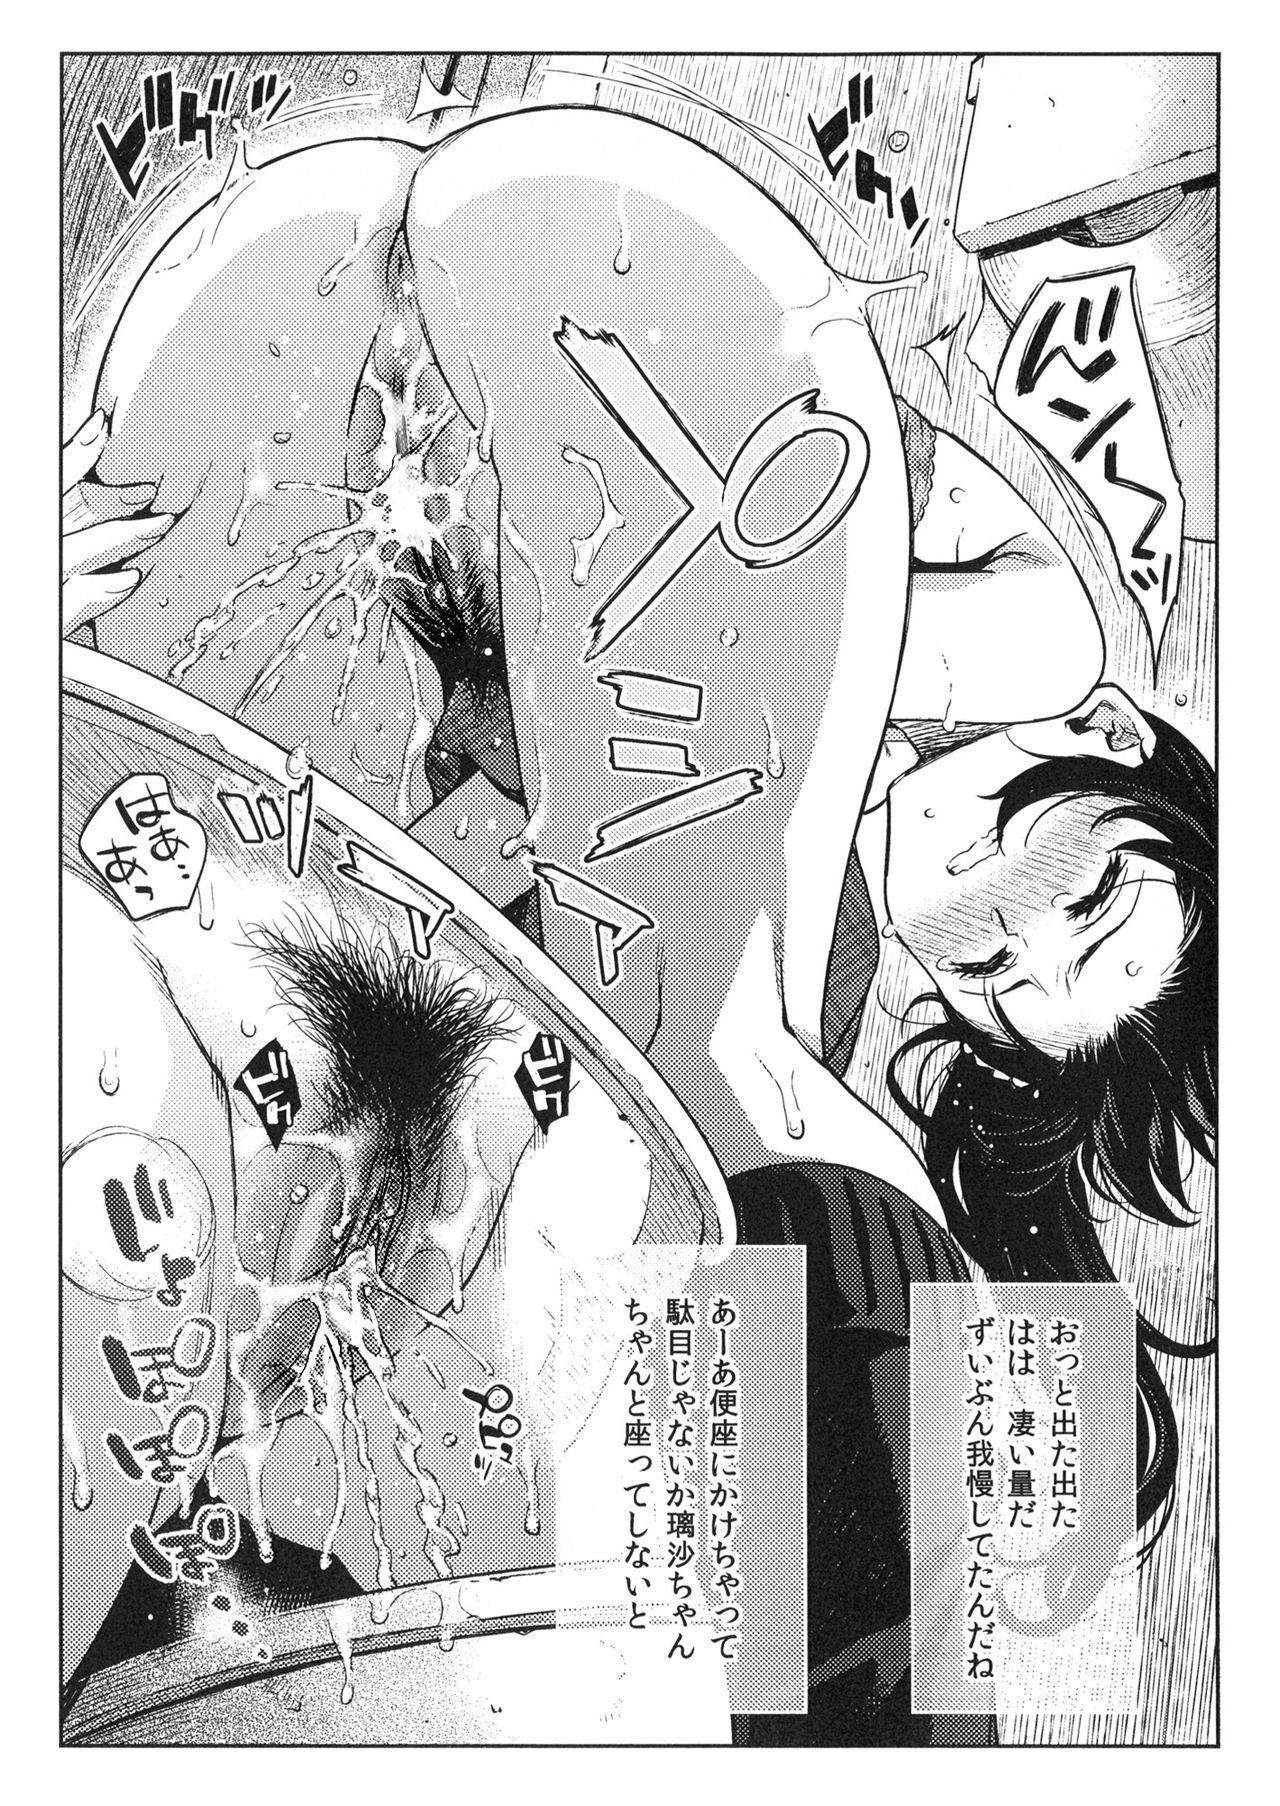 Kowaremono:Risa + Paper 28